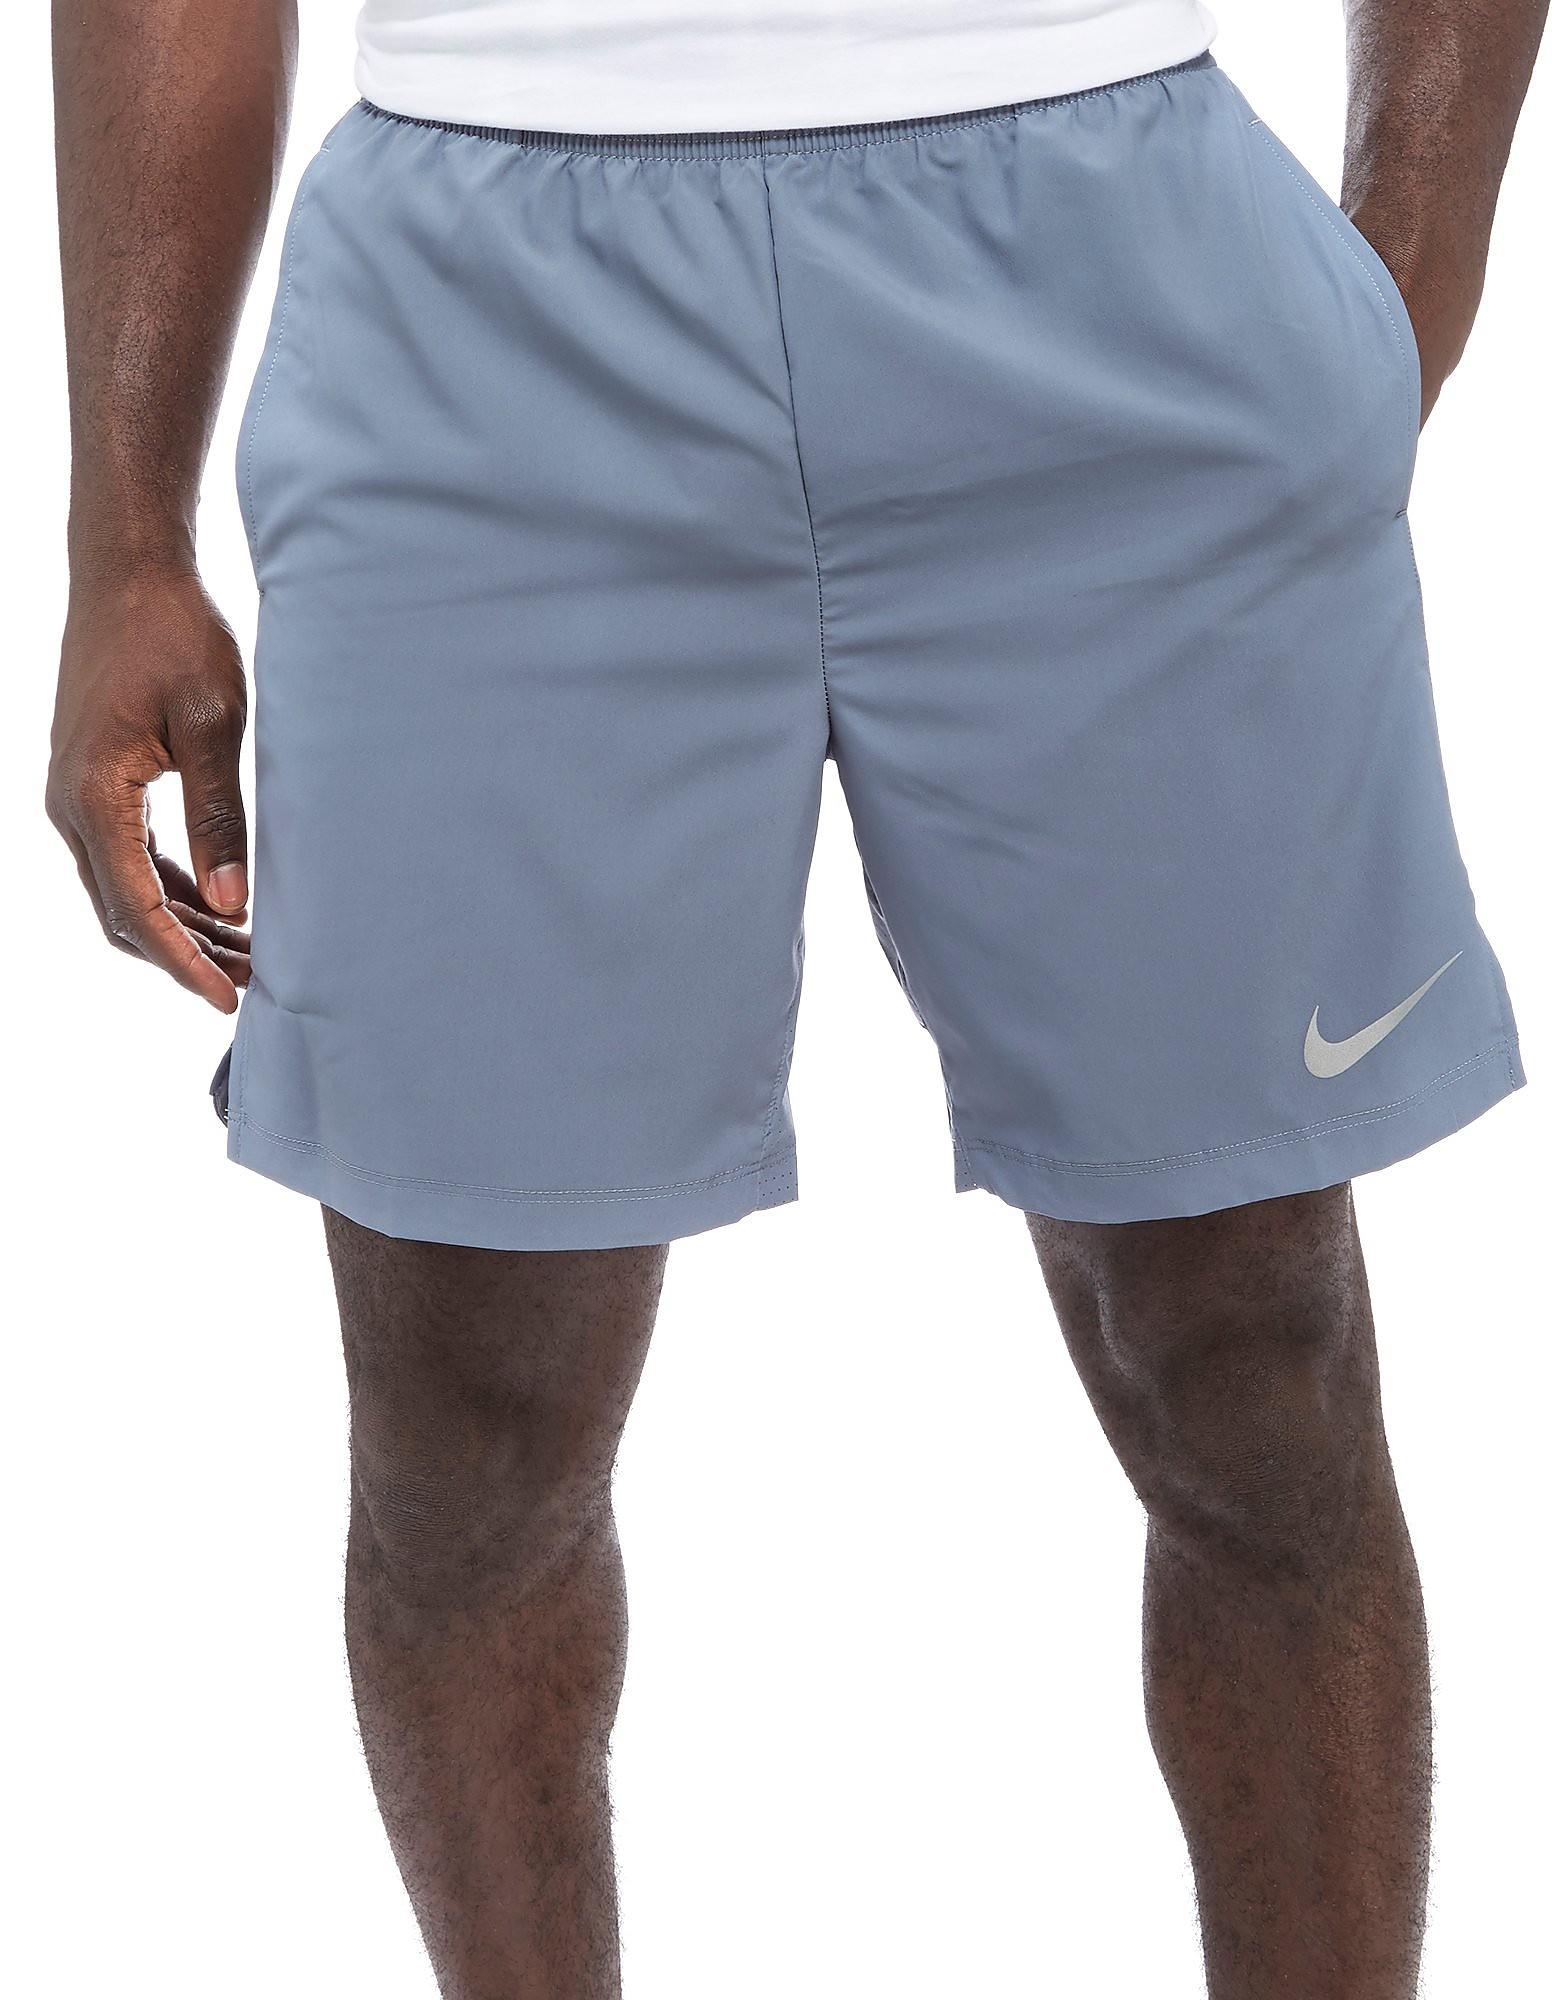 "Nike Challenger 7"" Shorts"